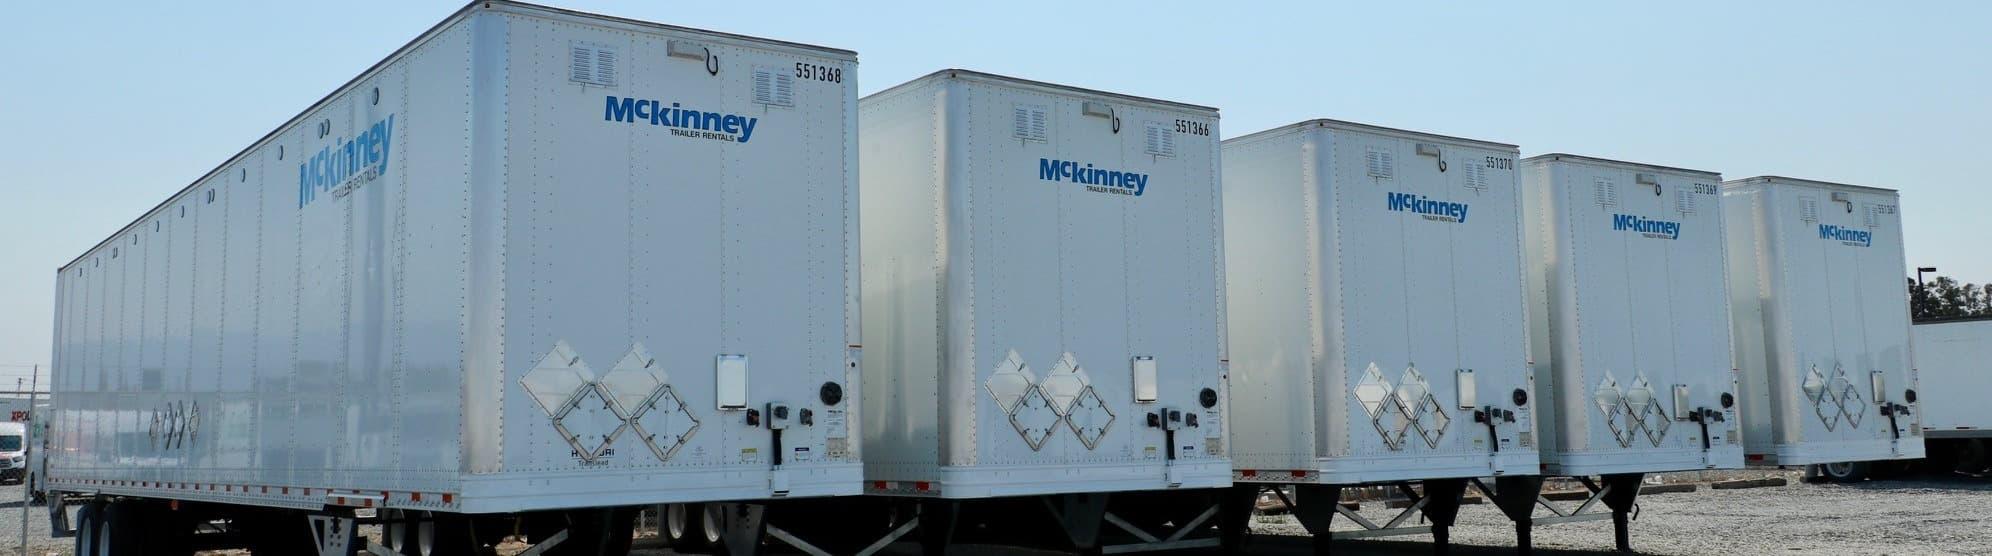 Mckinney Trailers